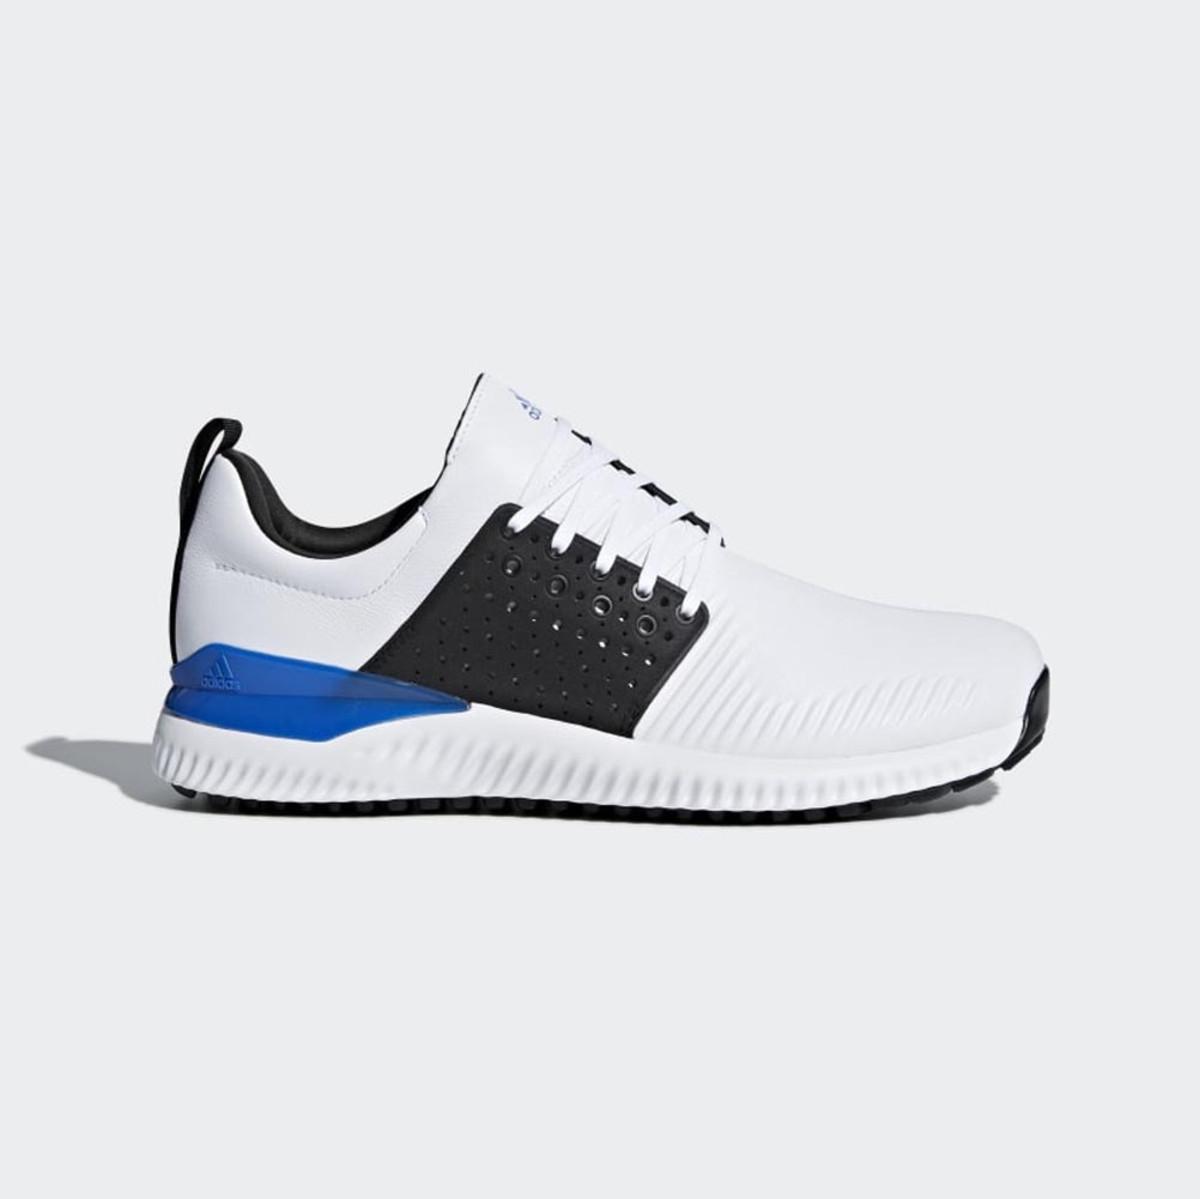 Adidas Adicross Bounce Cloud White/Black/Blue